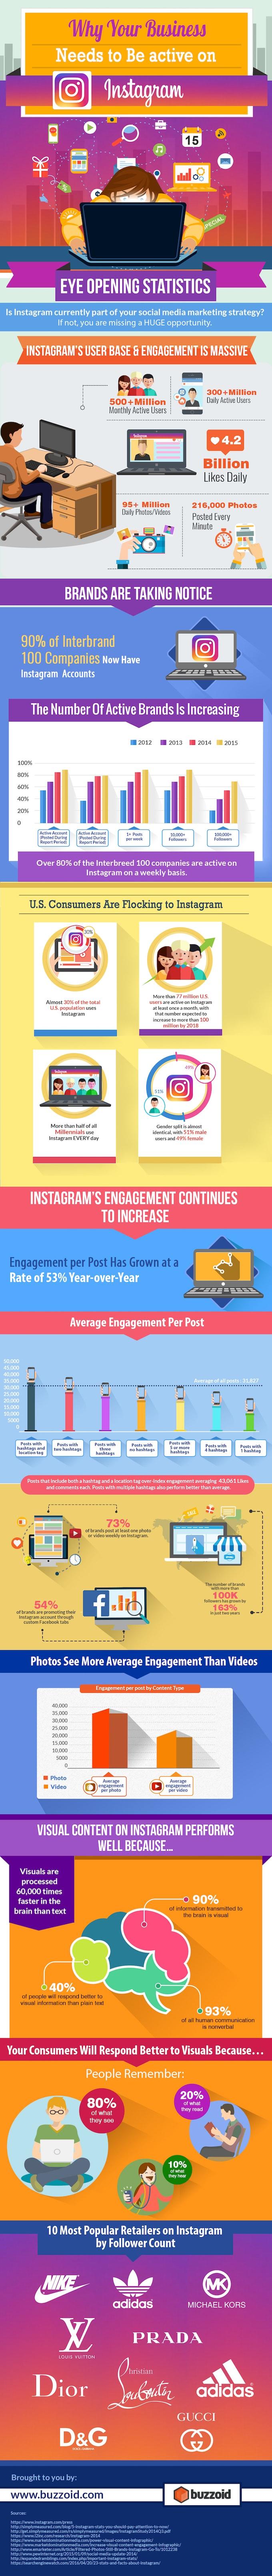 instagram-stats-infographic.jpg